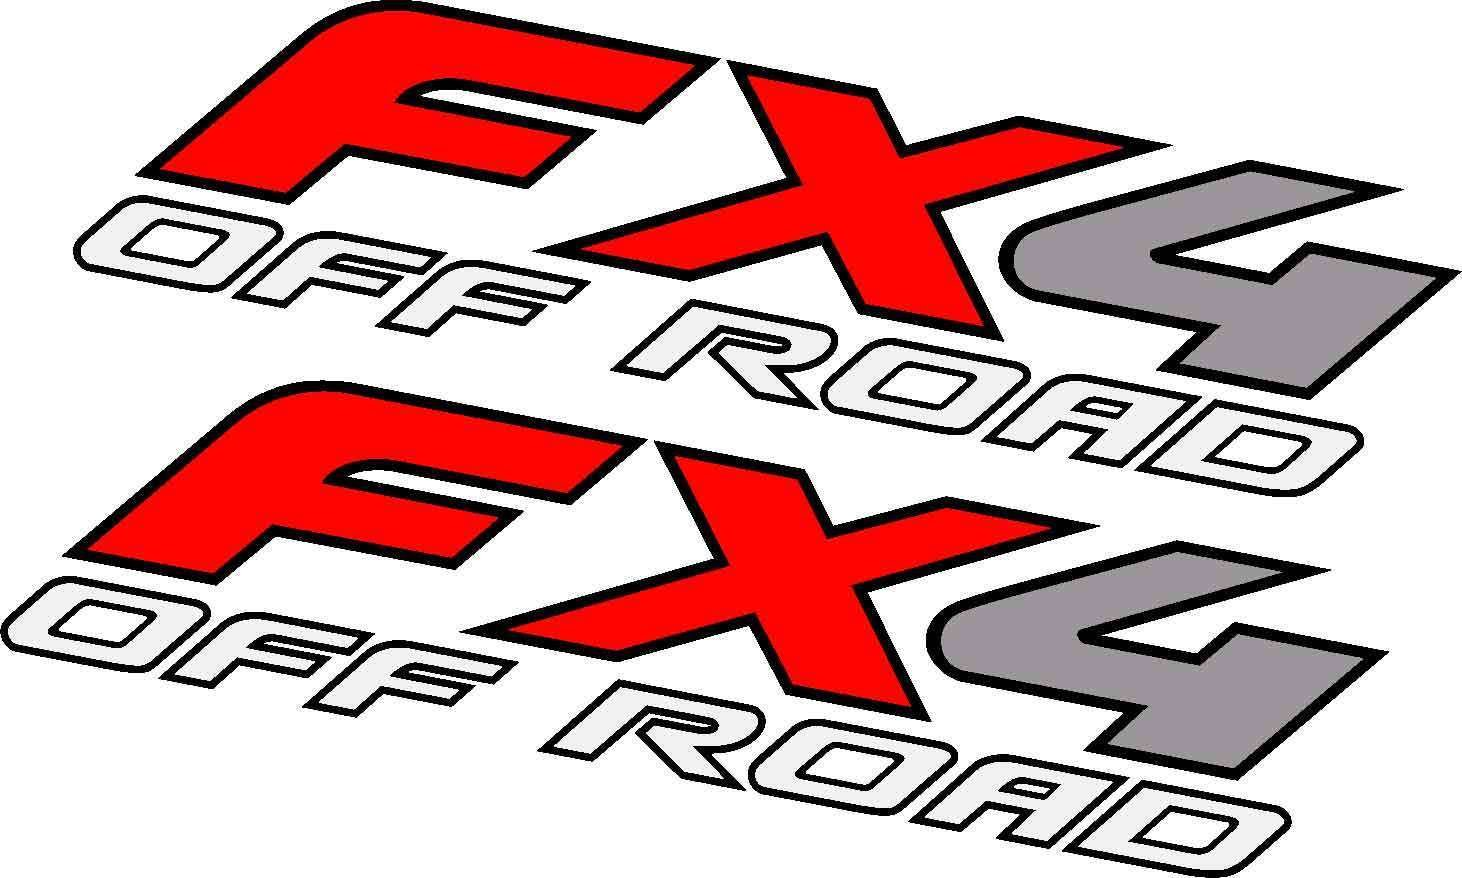 EZ CUT PRO 2X 2006 F250 FX4 Offroad Decals Stickers F Truck Super Duty Off Road Bed